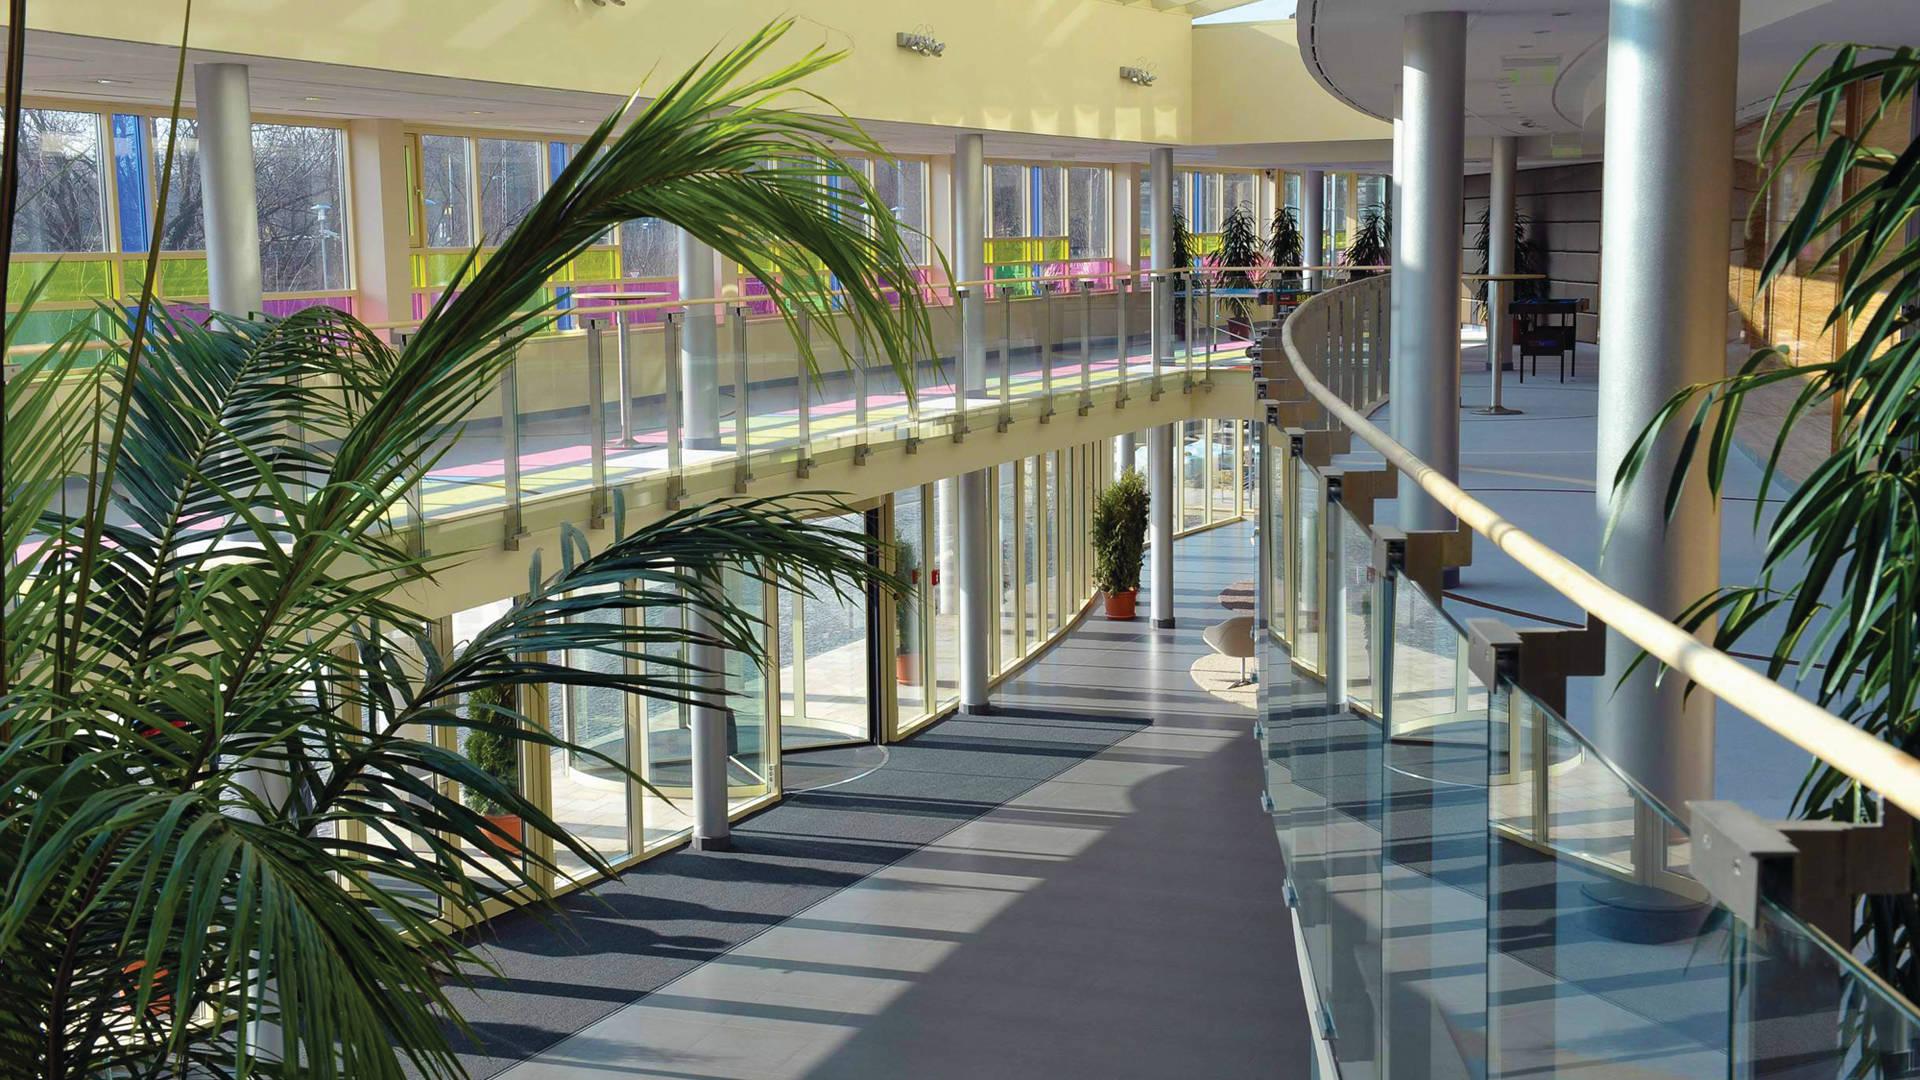 Velence Resort & Spa - Kép a lobby-ról